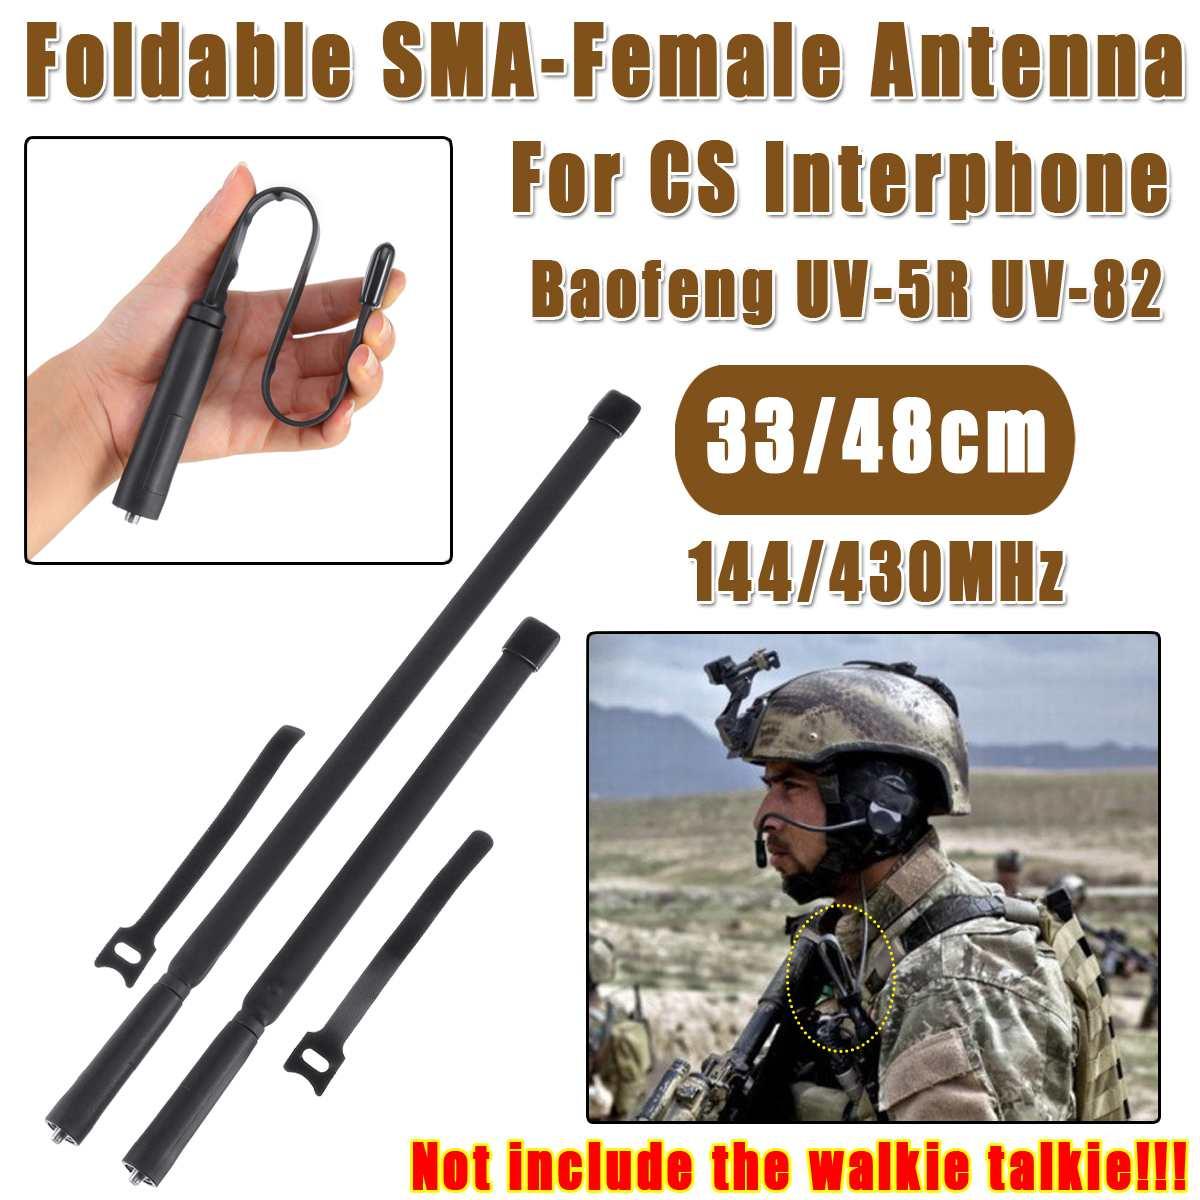 48cm Foldable SMA-Female Connector Dual Band Tactical Antenna 144/430Mh For CS Interphone Baofeng UV-5R UV-82 Ham Radio Antenna